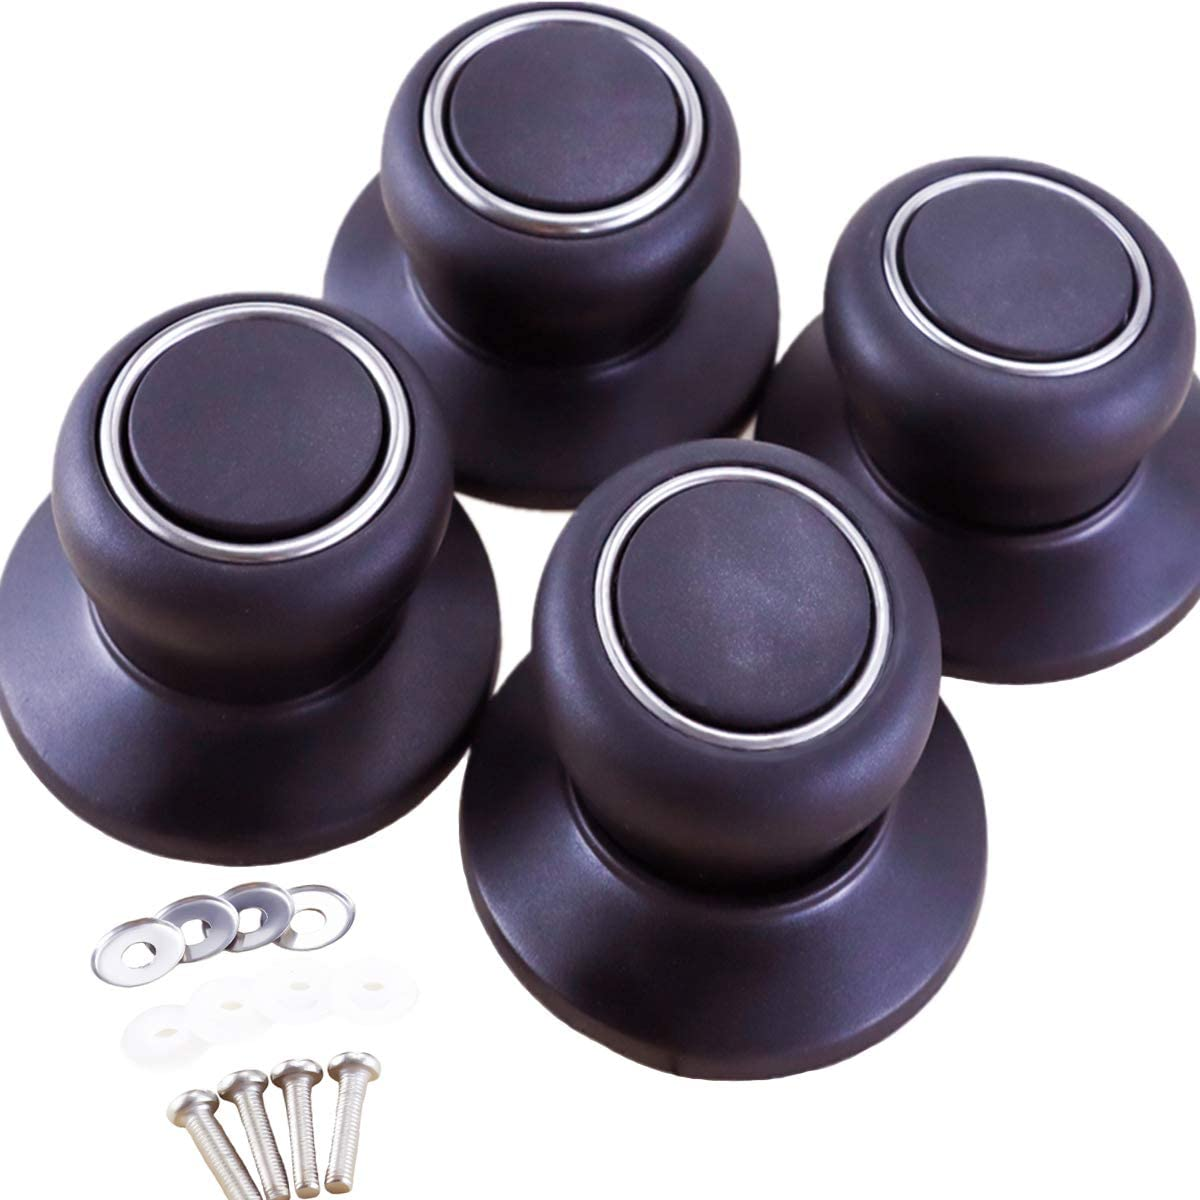 YG_Oline 4 Pack Lid Knob, Universal Black Cookware Replacement Knob Pot Knob Pot Lid